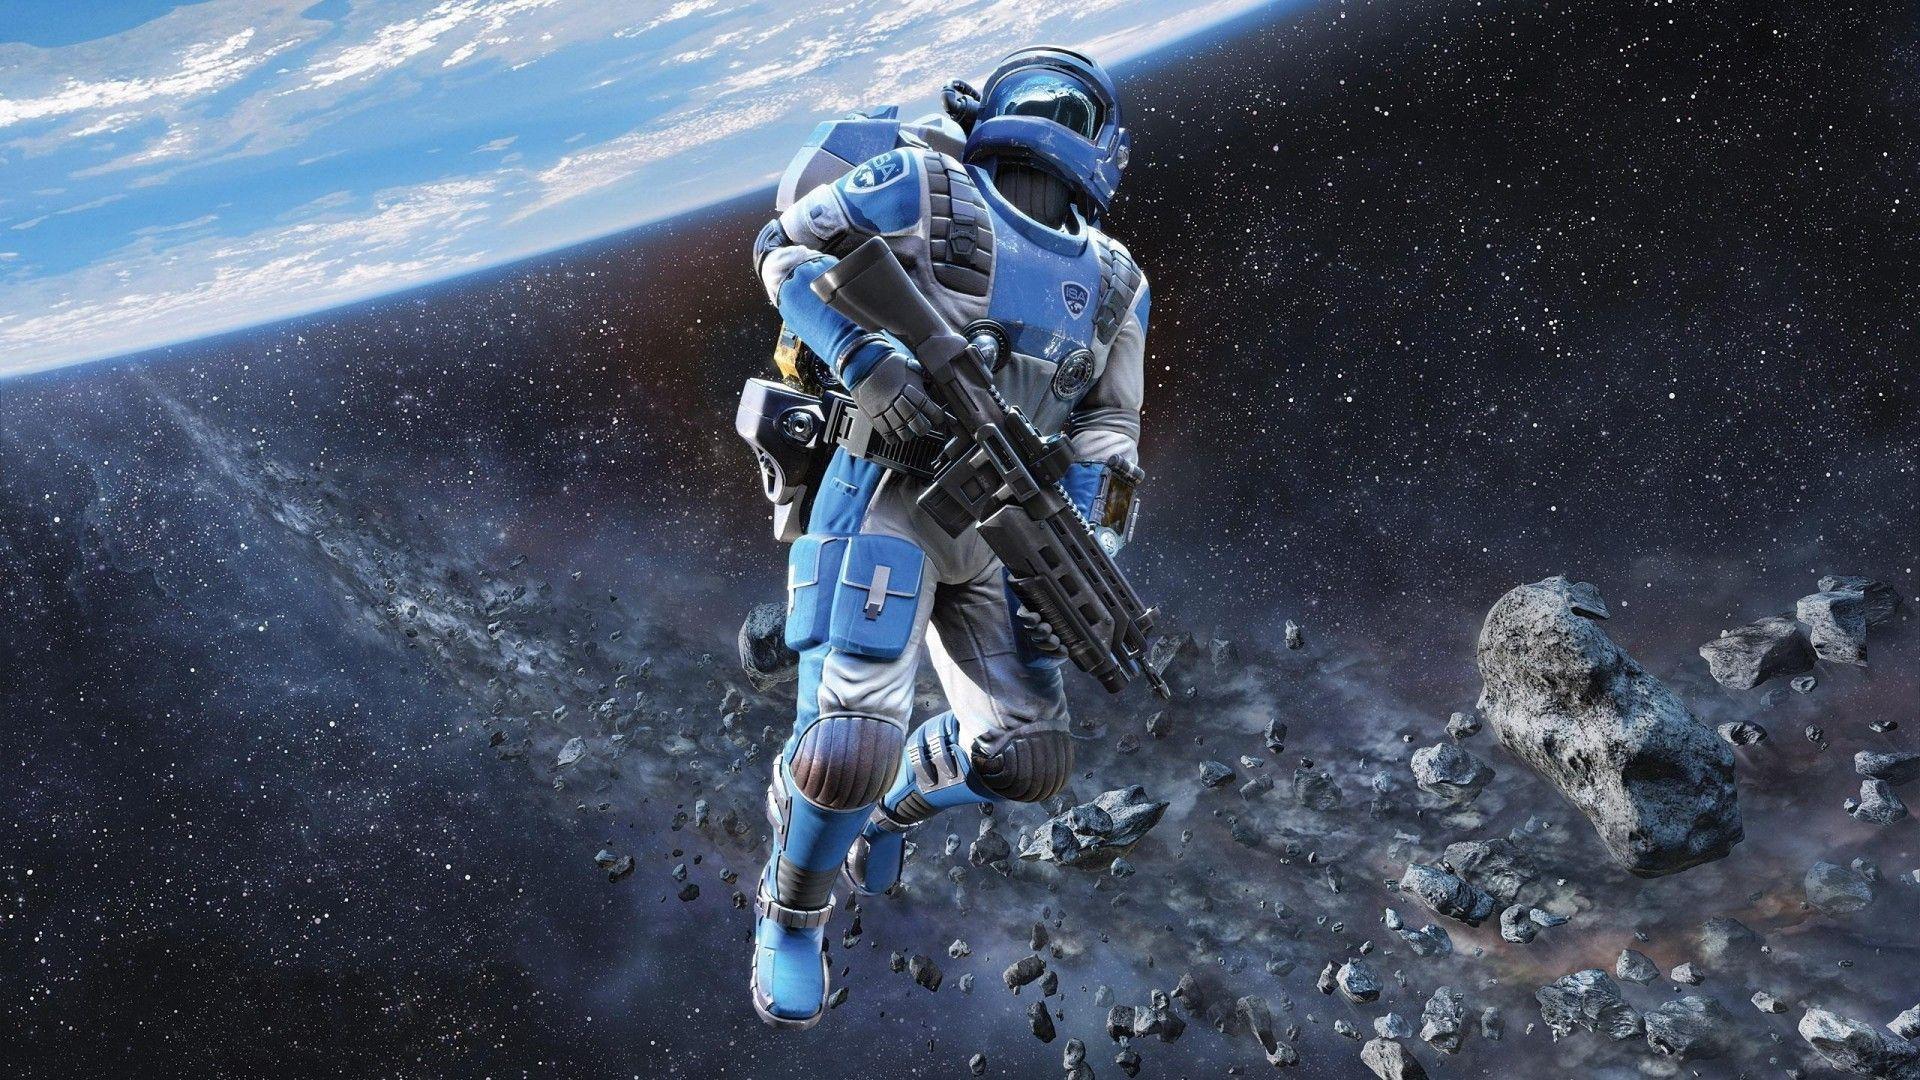 Future Astronaut Jpg 1920 1080 Sci Fi Wallpaper Science Fiction Illustration Hd Backgrounds